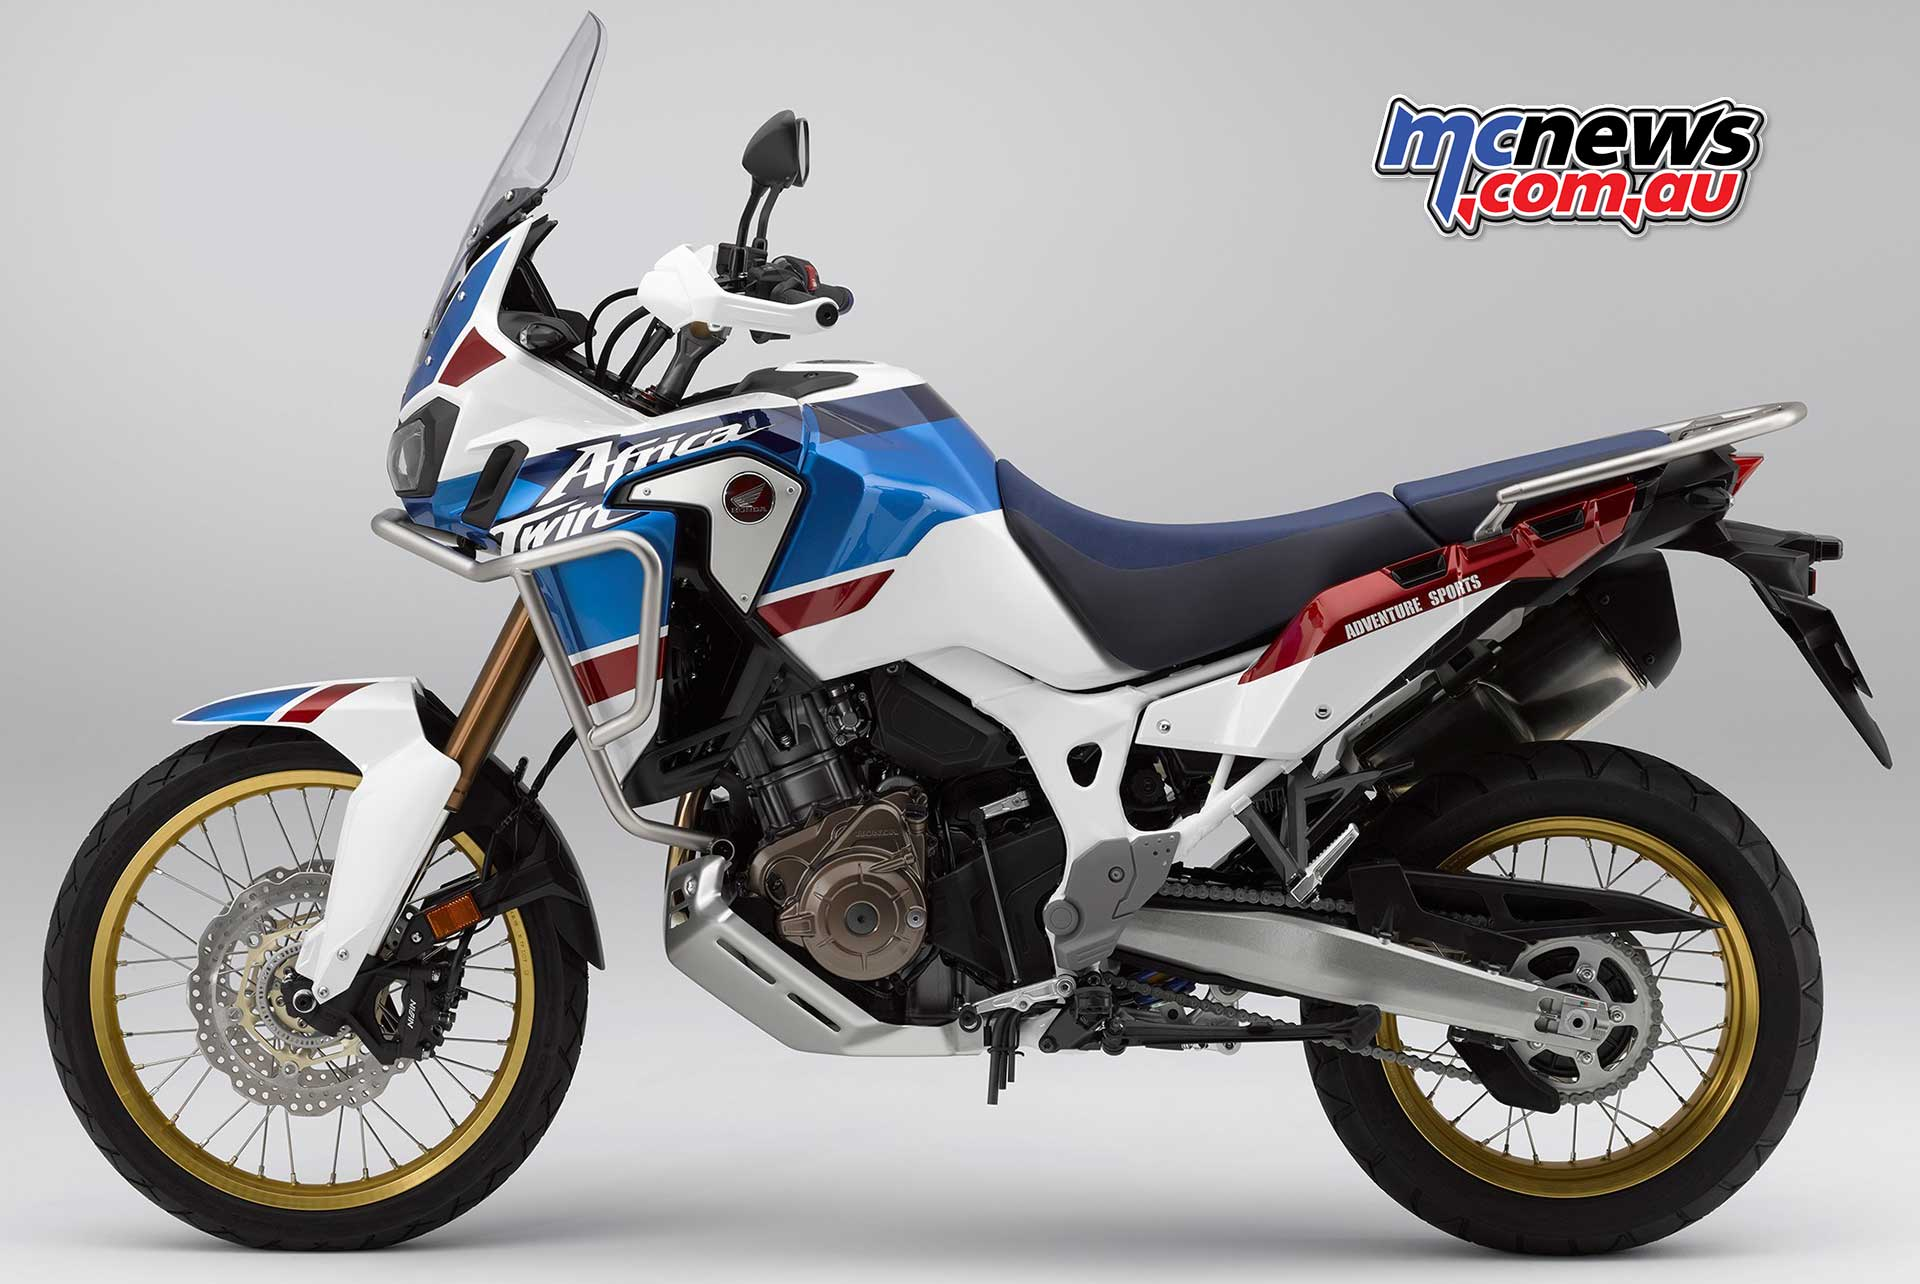 2018-Honda-Africa-Twin-Adventure-Sports-LHS-2.jpg